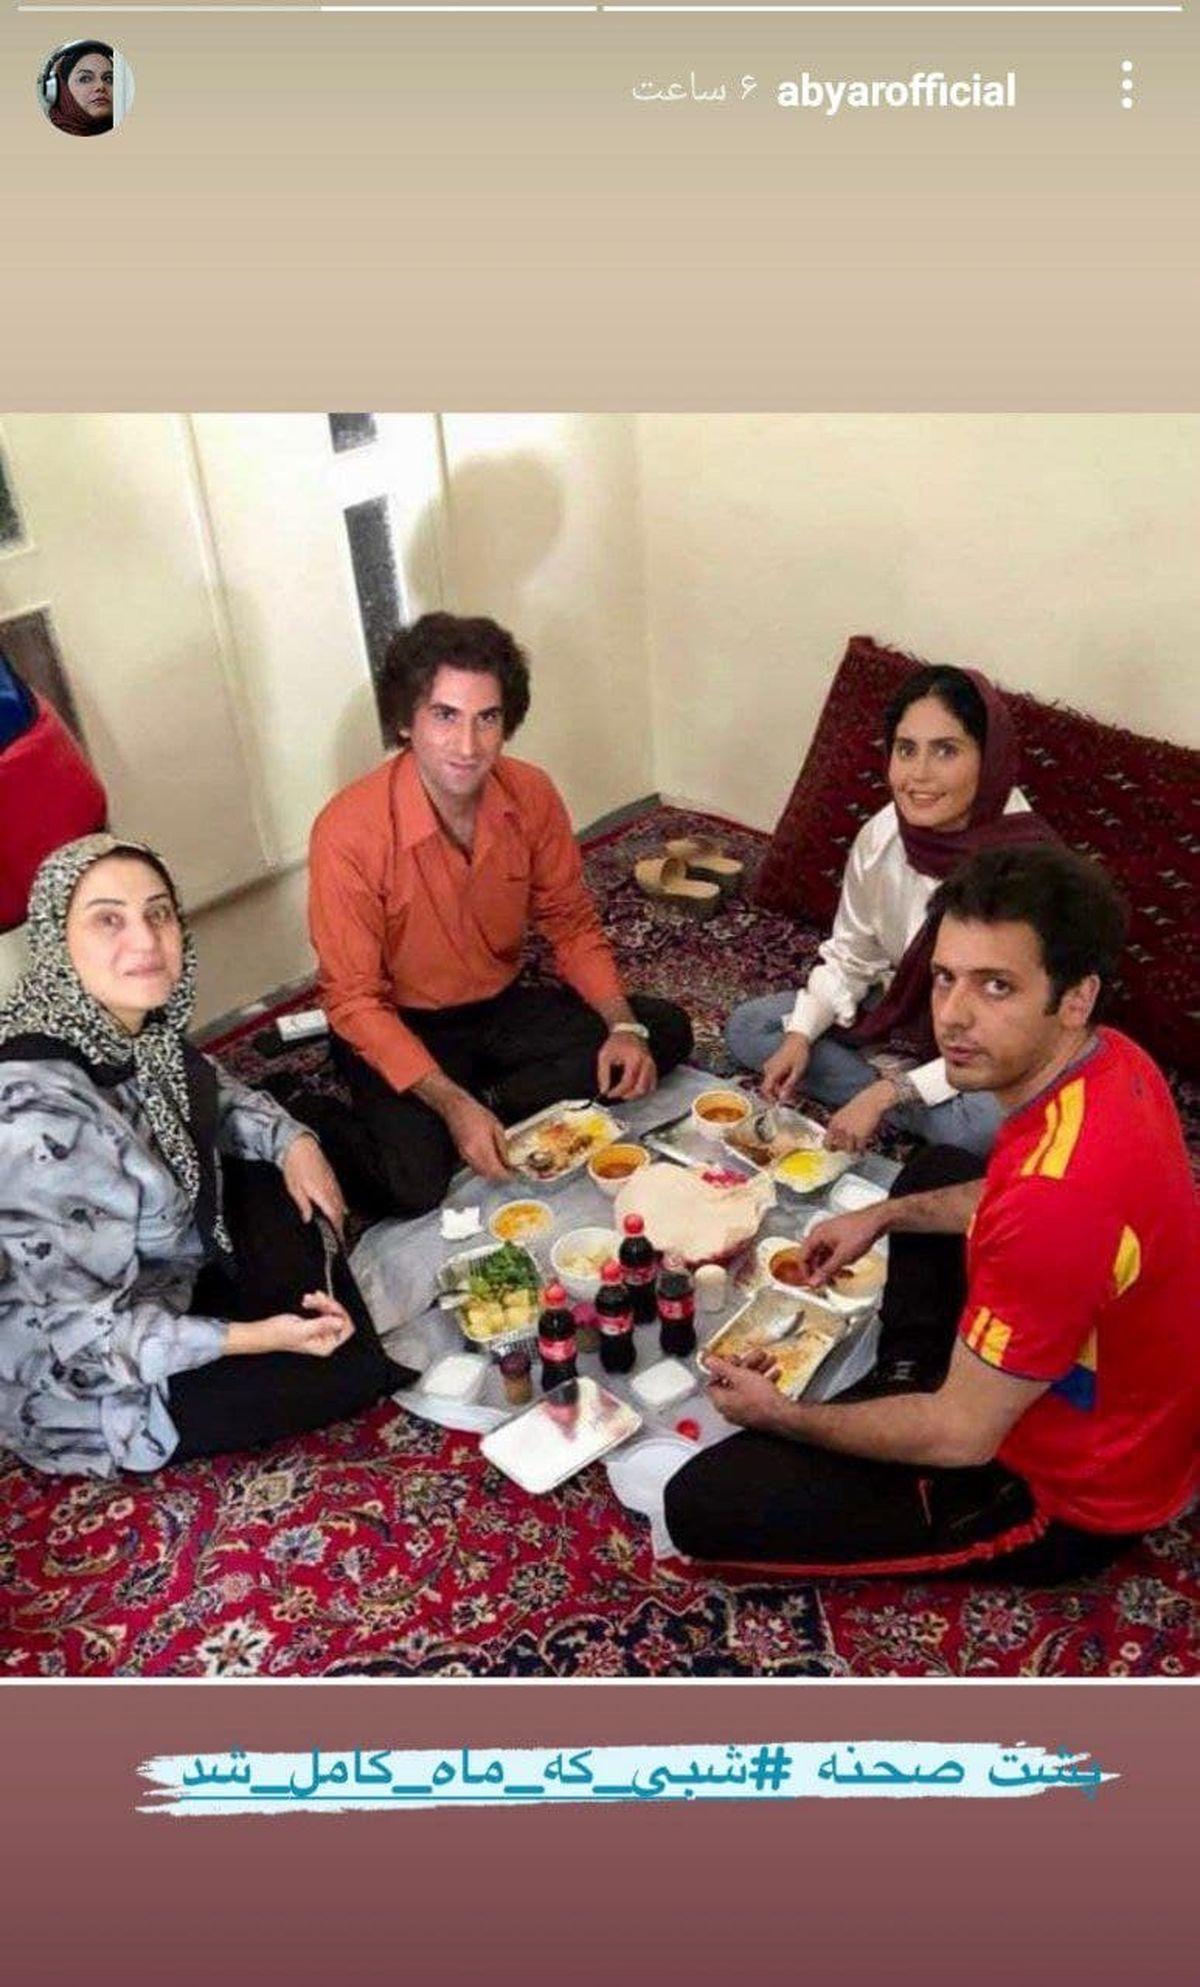 تیپ عجیب پدرام شریفی سر سفره +عکس